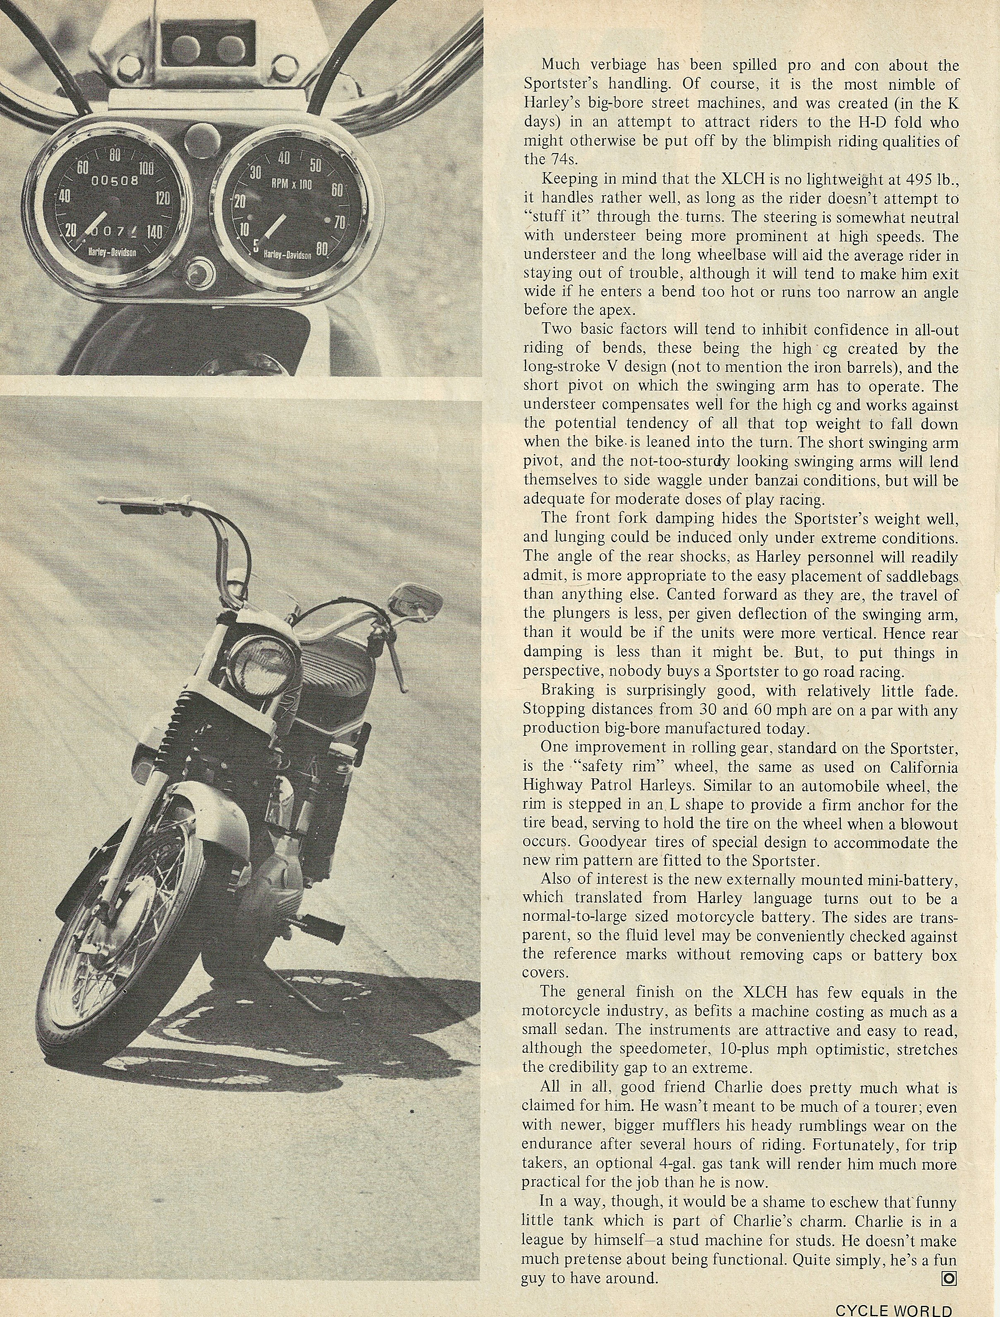 1969 Harley Davidson Sportster XLCH road test 4.jpg